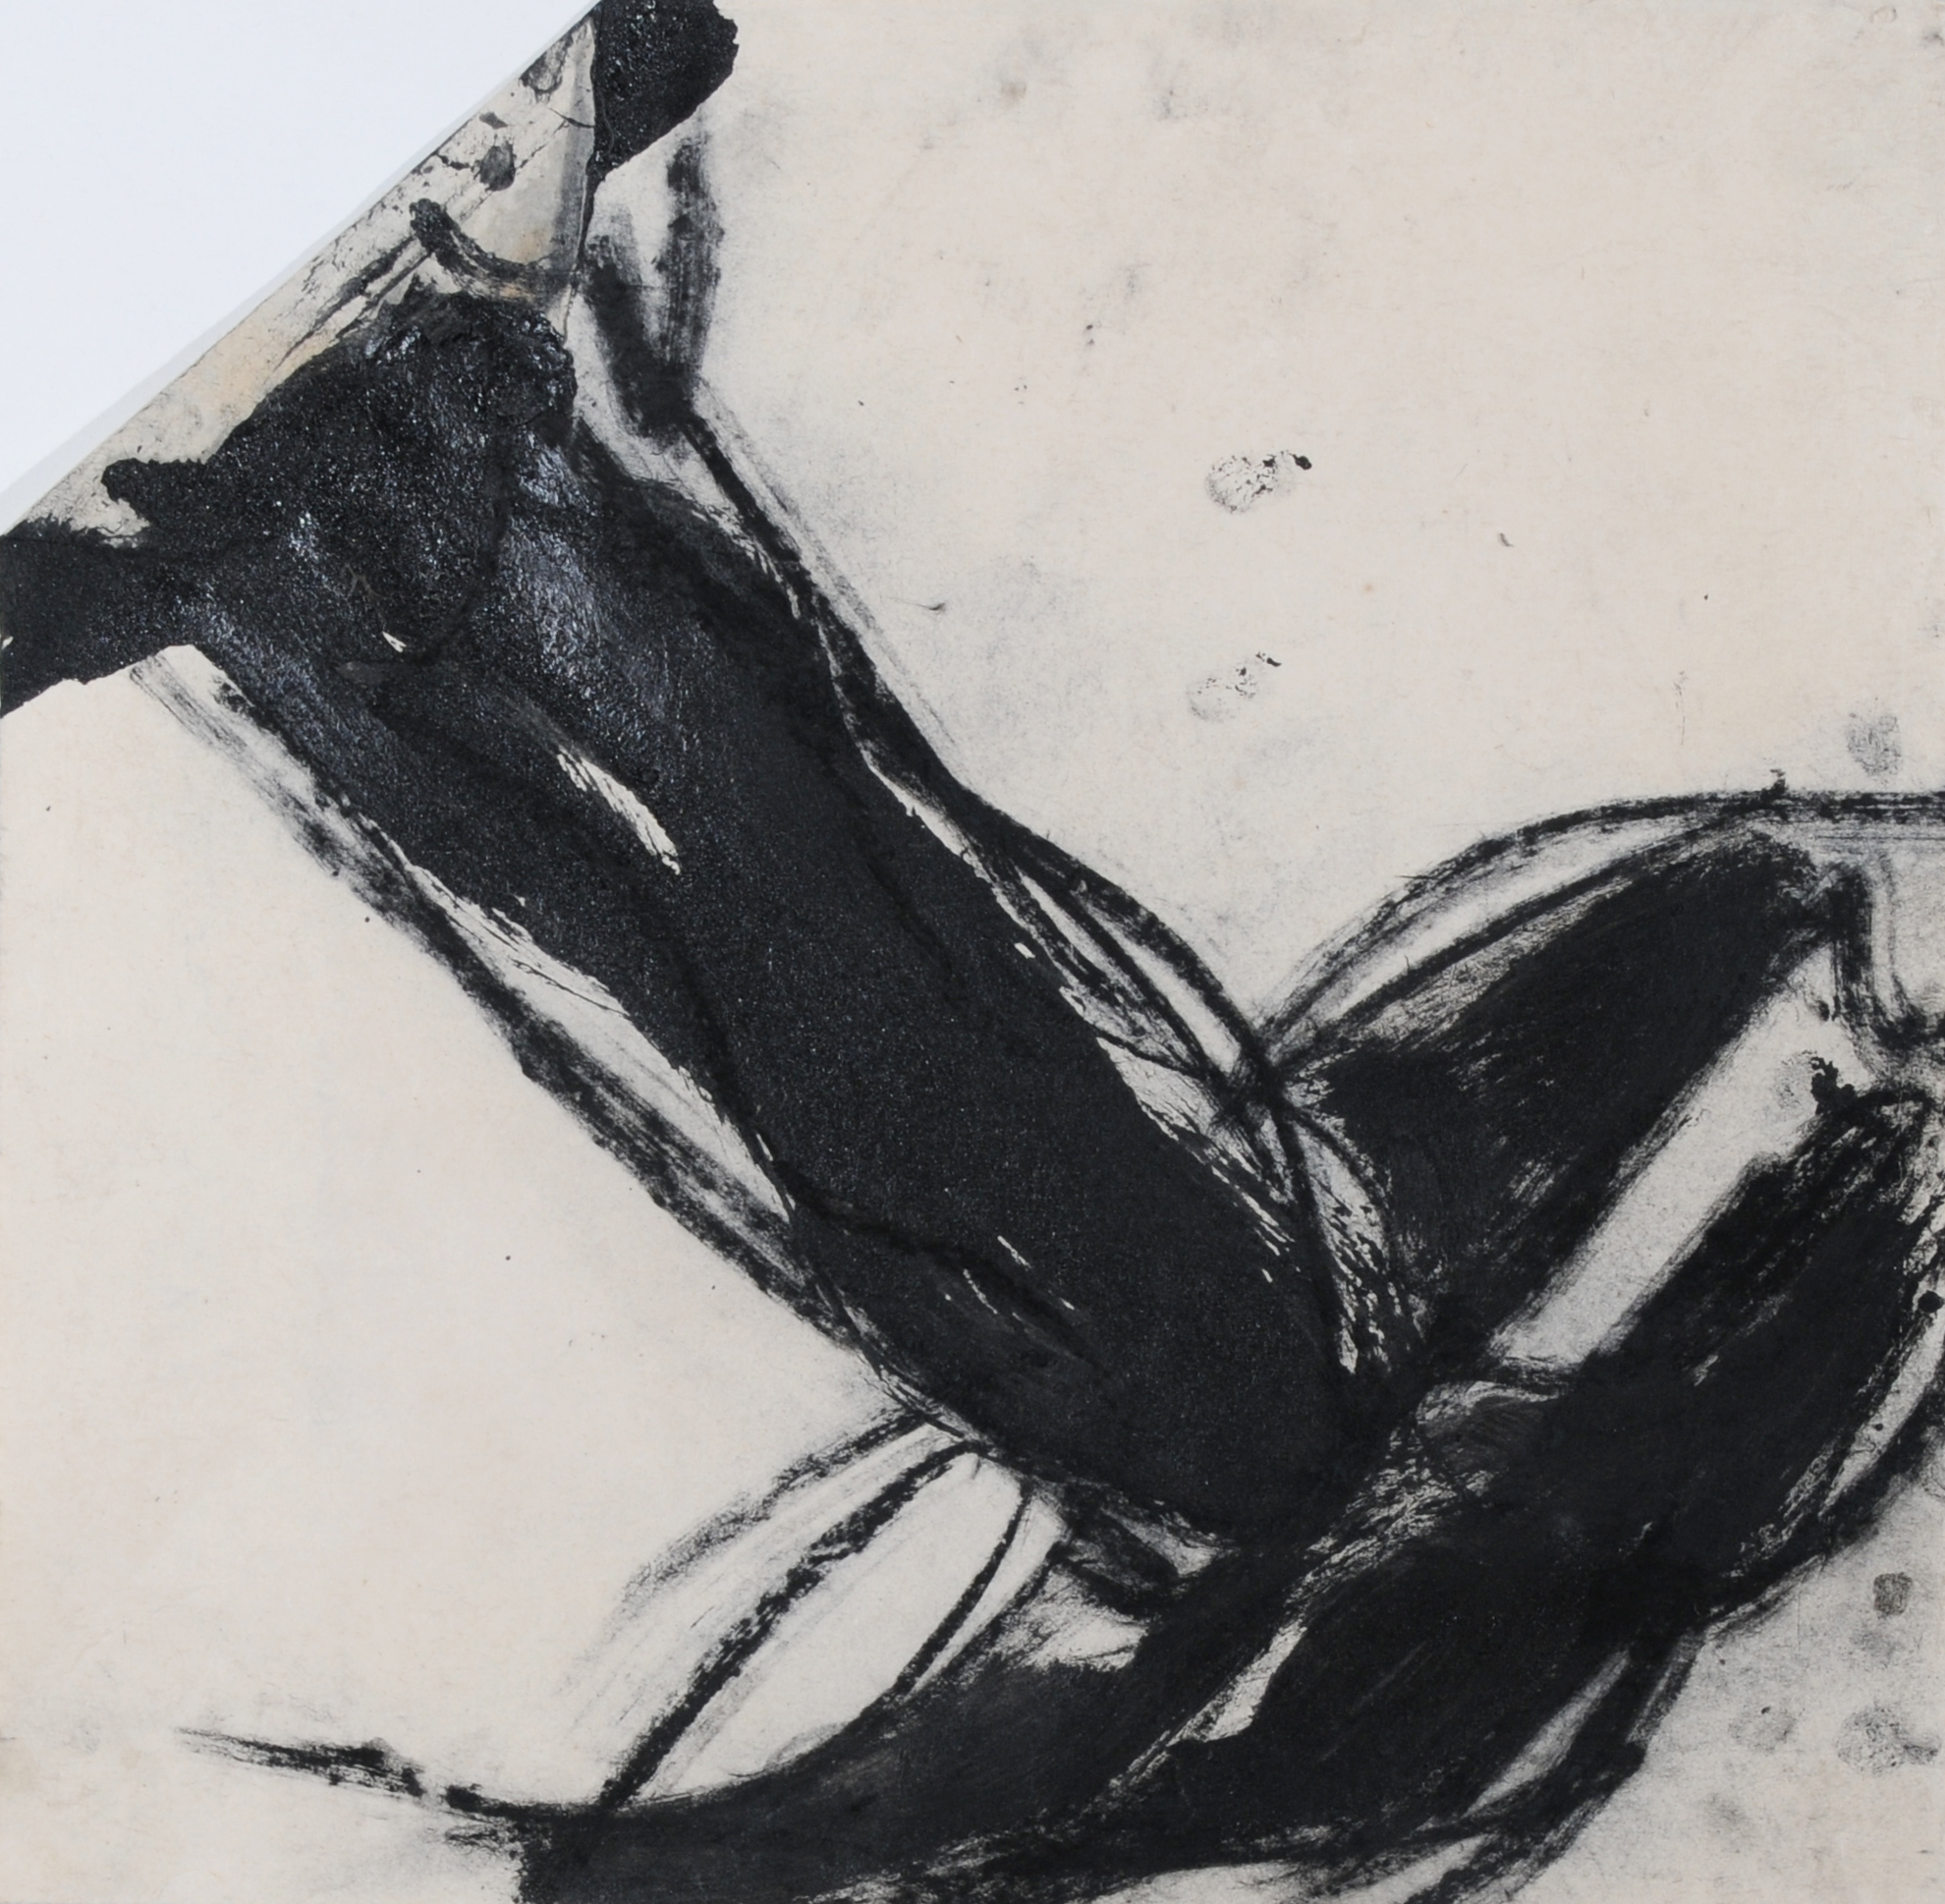 Spagnulo Giuseppe, Senza titolo (Untitled)